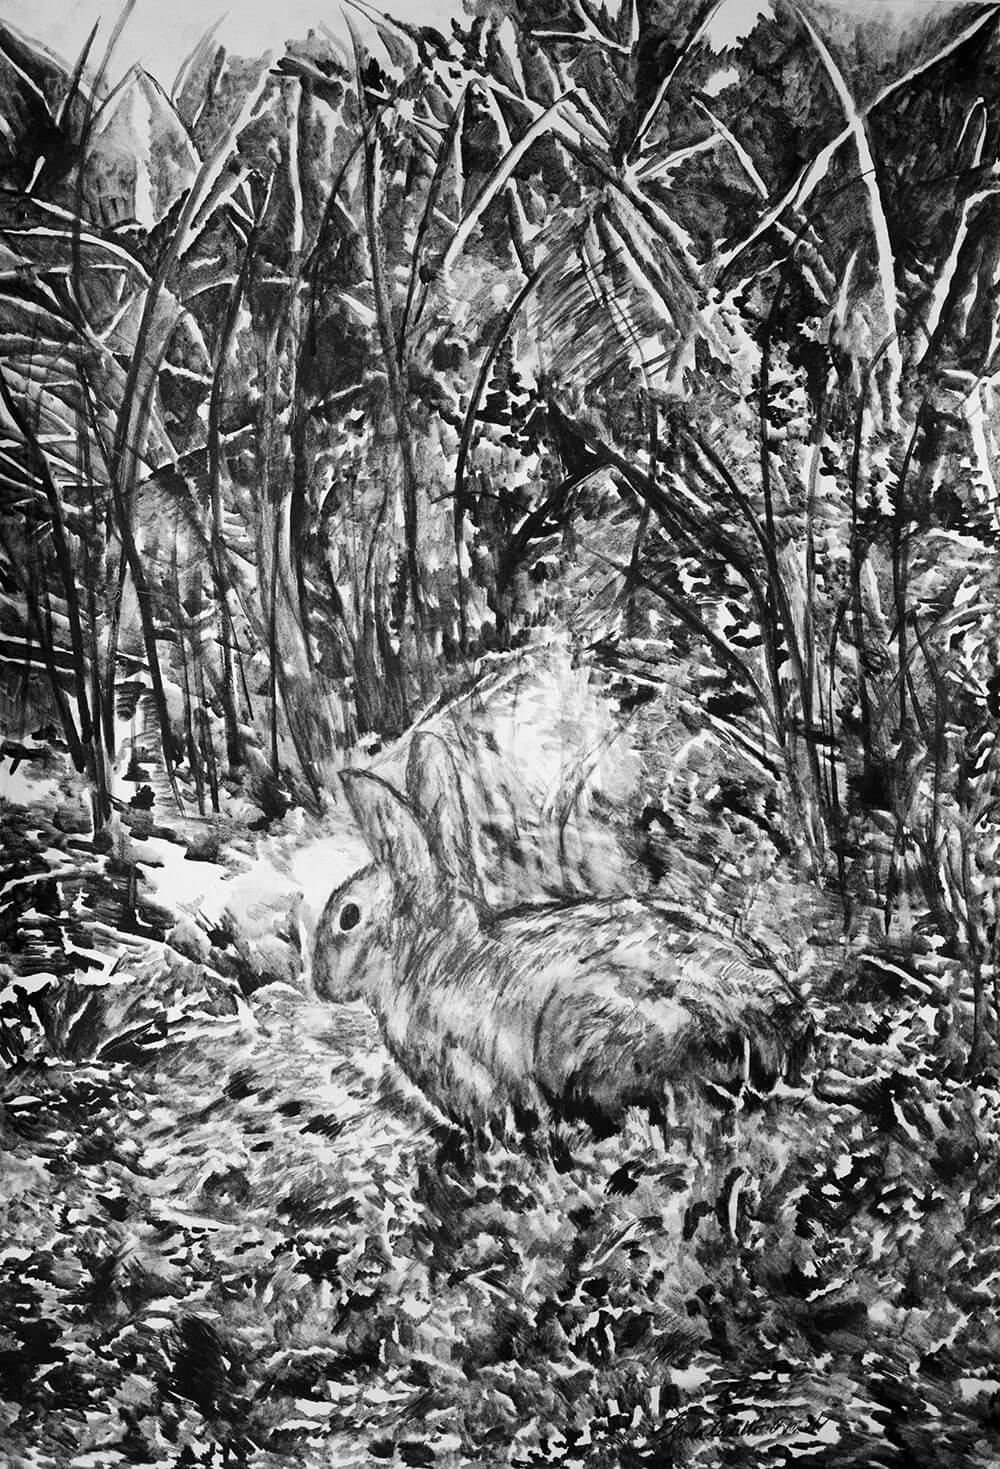 Animals, watercolour graphite on cotton papere, 102 x 66 cm., 2017.